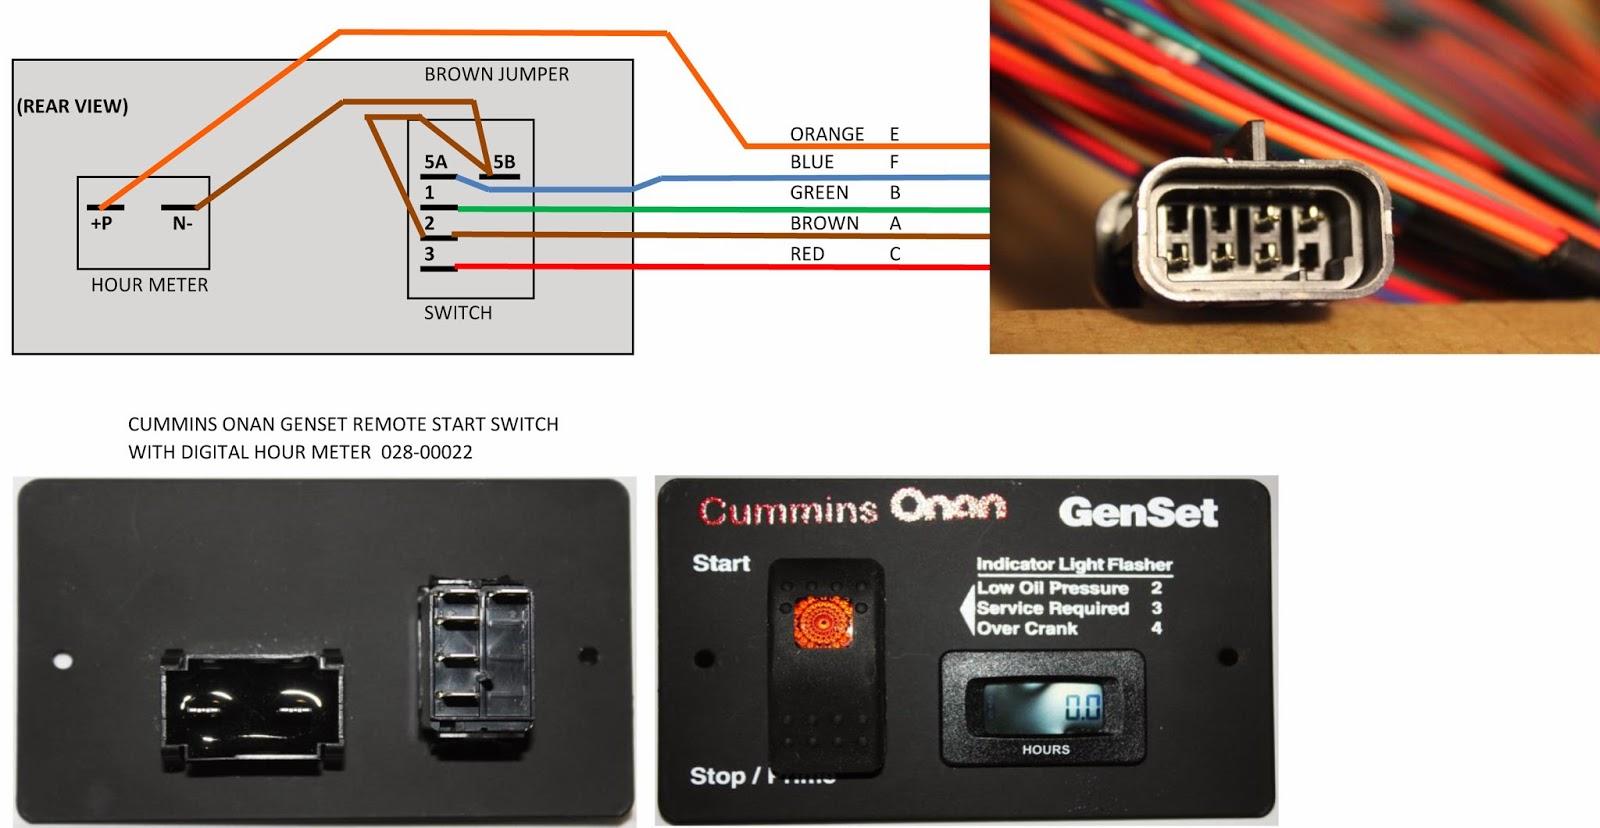 ONAN+REMOTE+SWITCH+WIRING?resize=665%2C344 onan marquis 4000 generator wiring diagram the best wiring onan 2800 microlite generator wiring diagram at pacquiaovsvargaslive.co